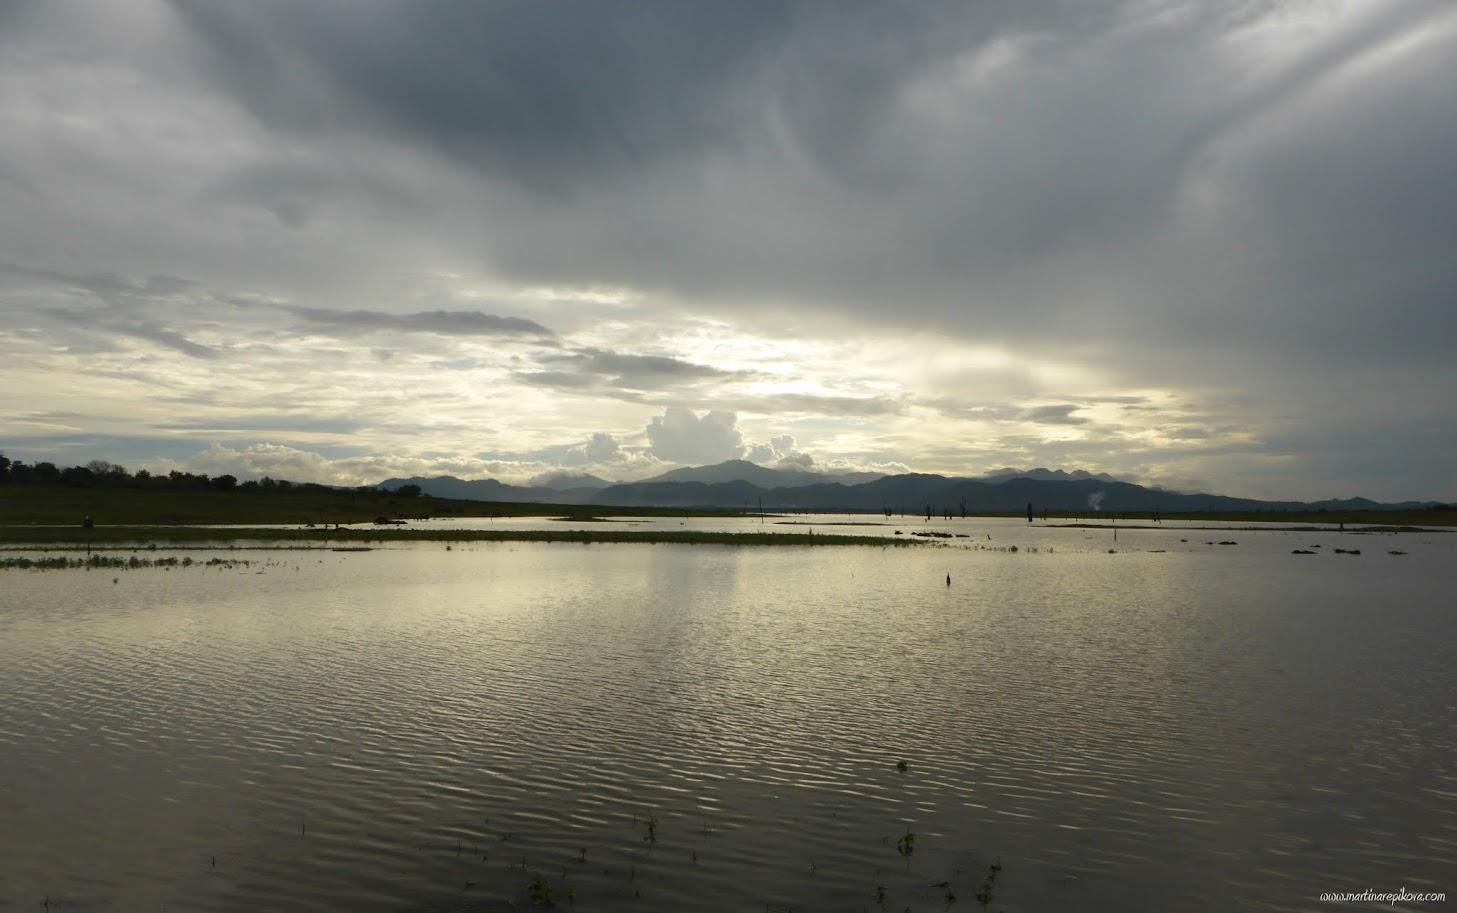 Uda Walawe reservoir, Uda Walawe, Sri Lanka